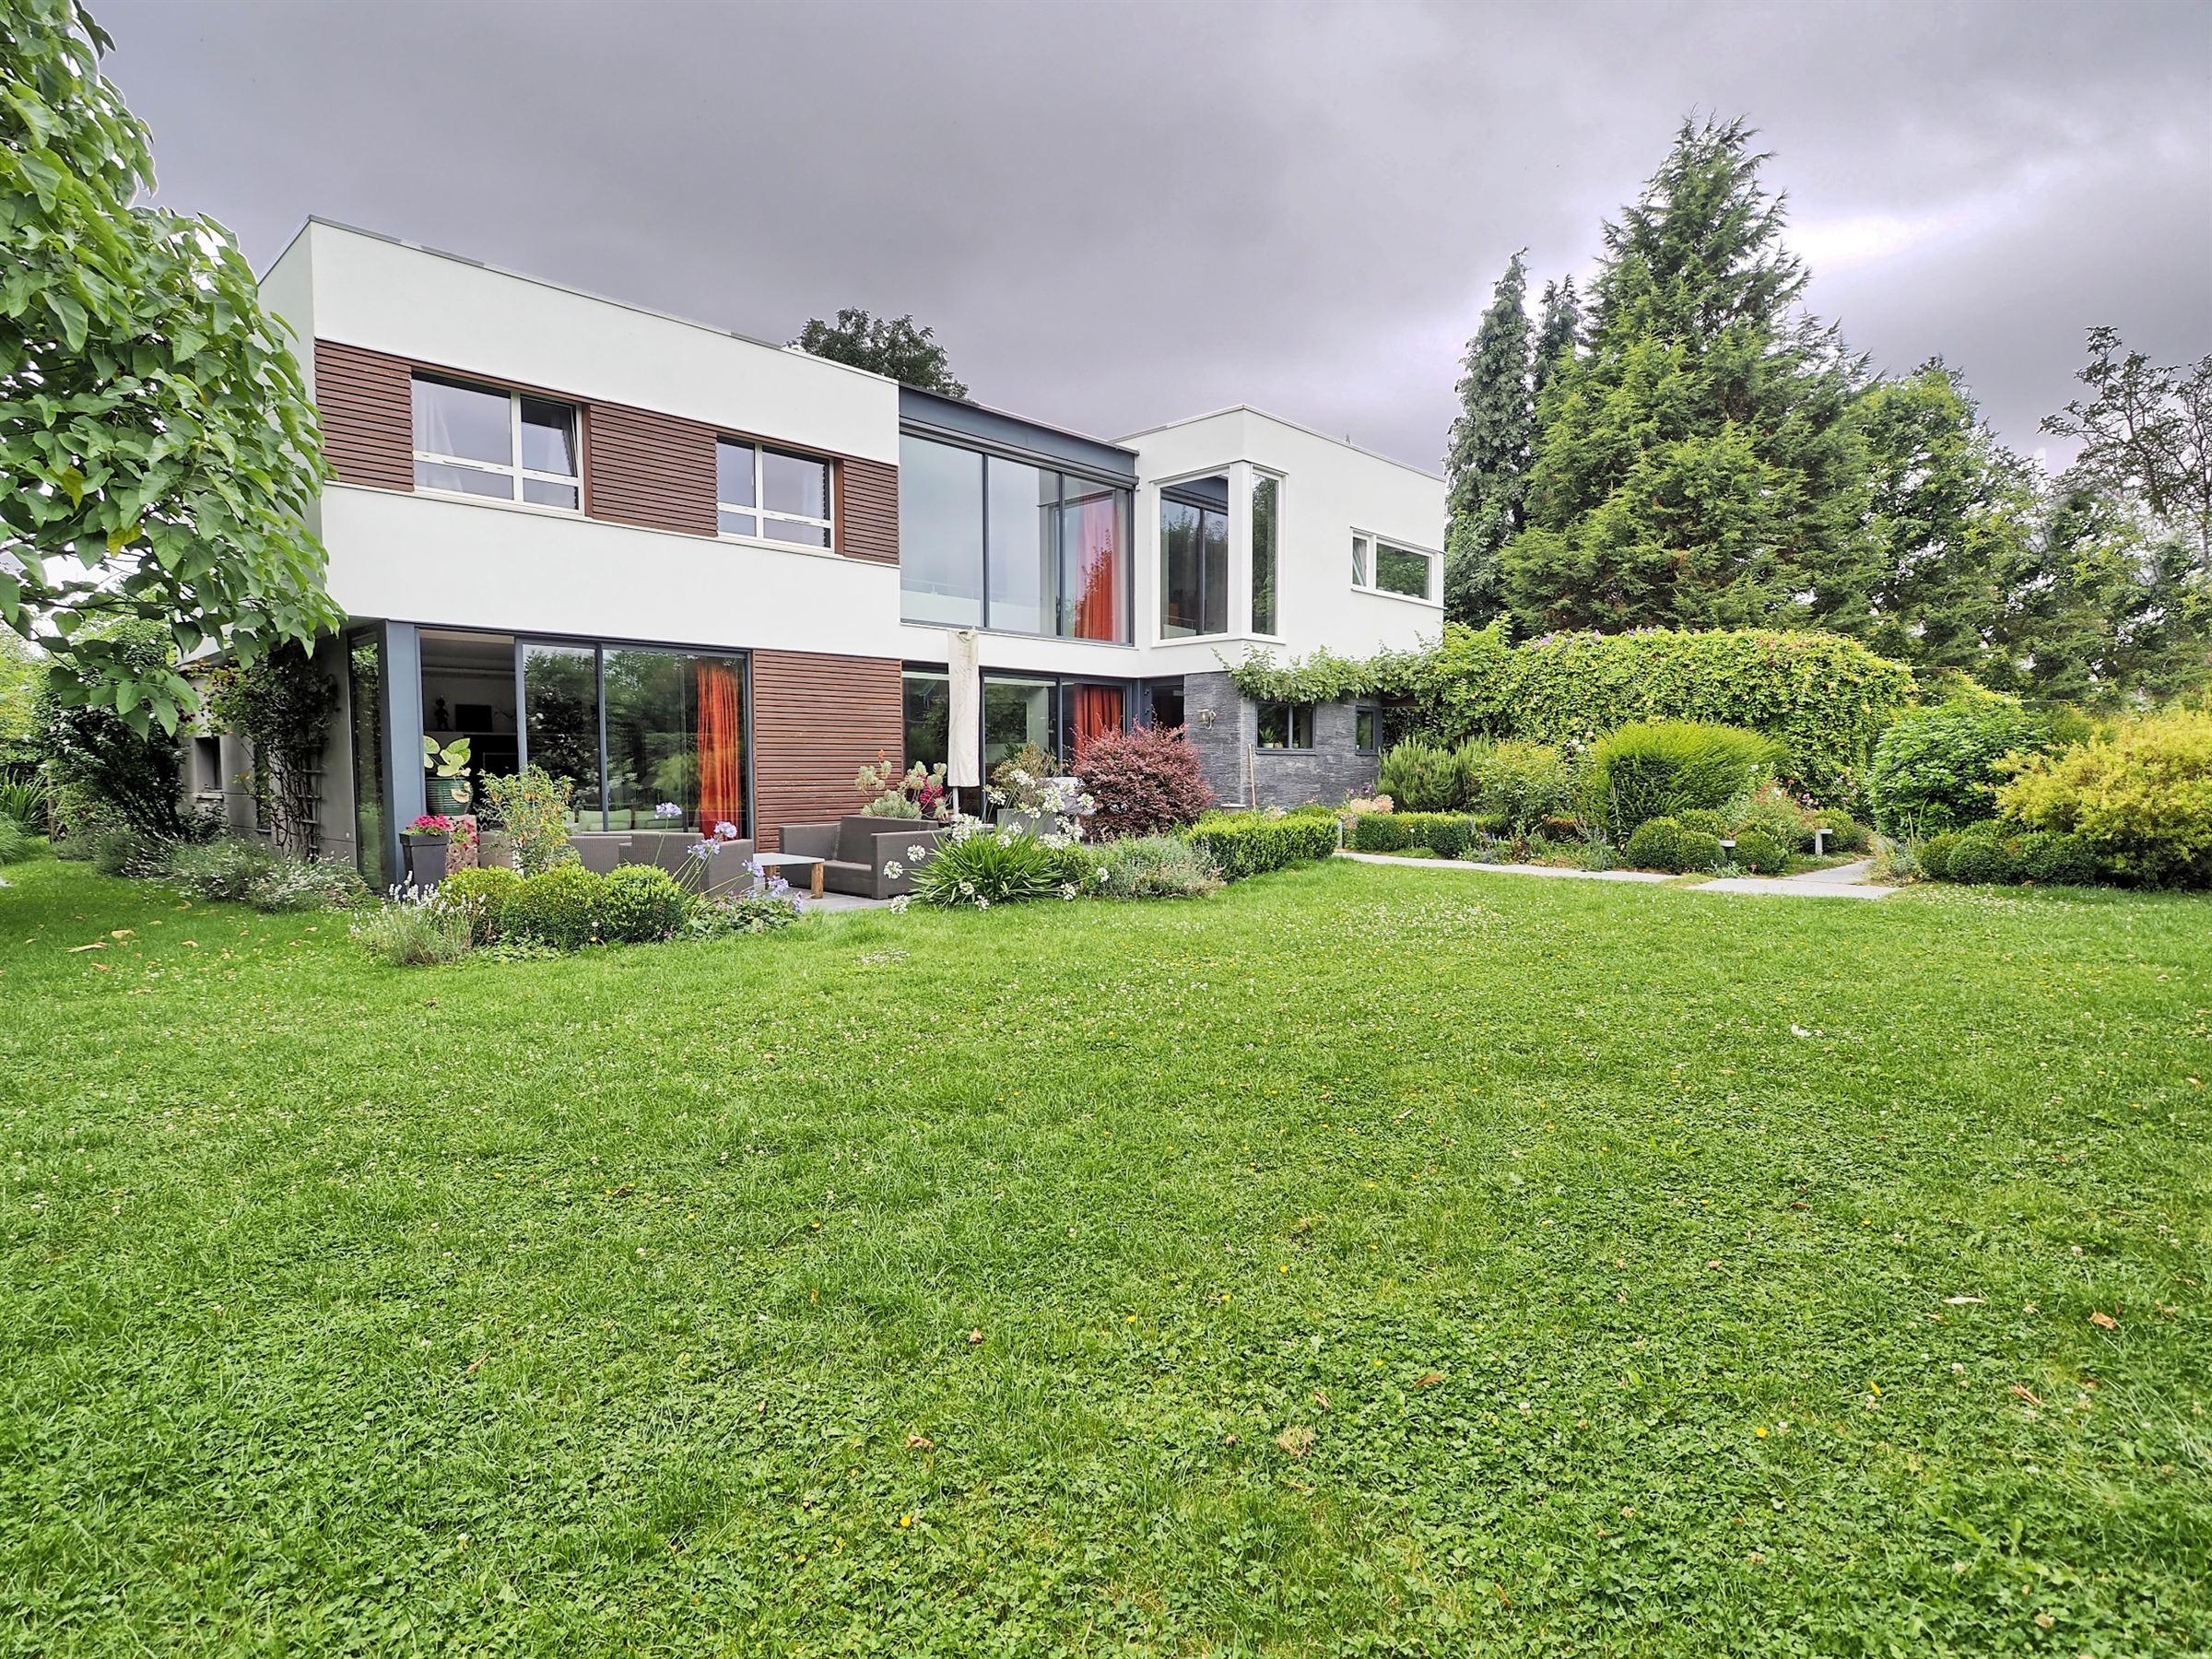 sales property at LAMBERSART, popular neighborhood, Architect house 220 m², 4 ch. Garage